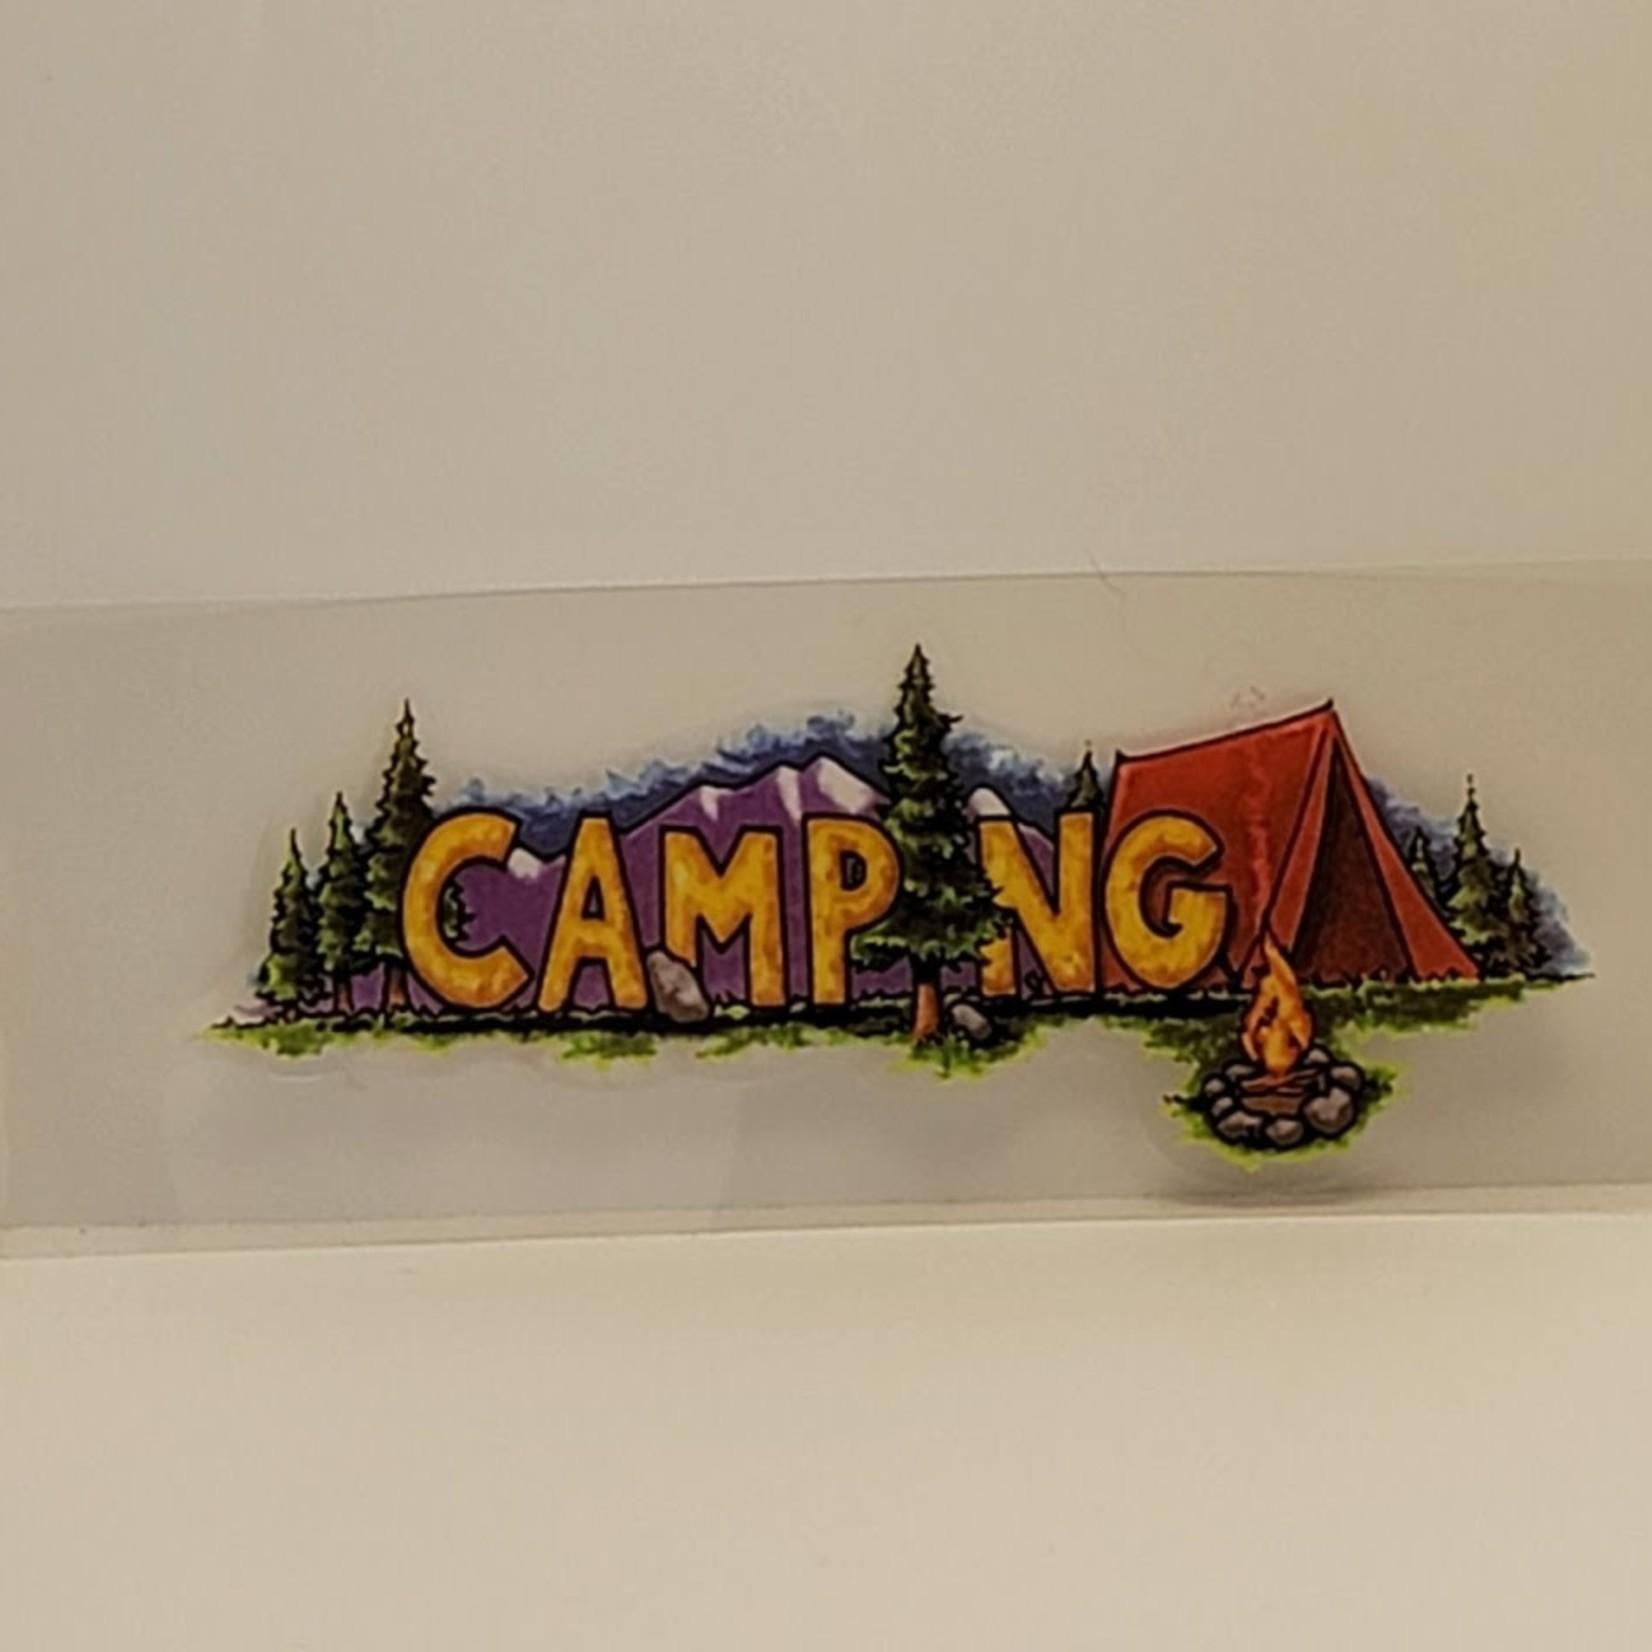 sticko - Heading Sticker - Camping